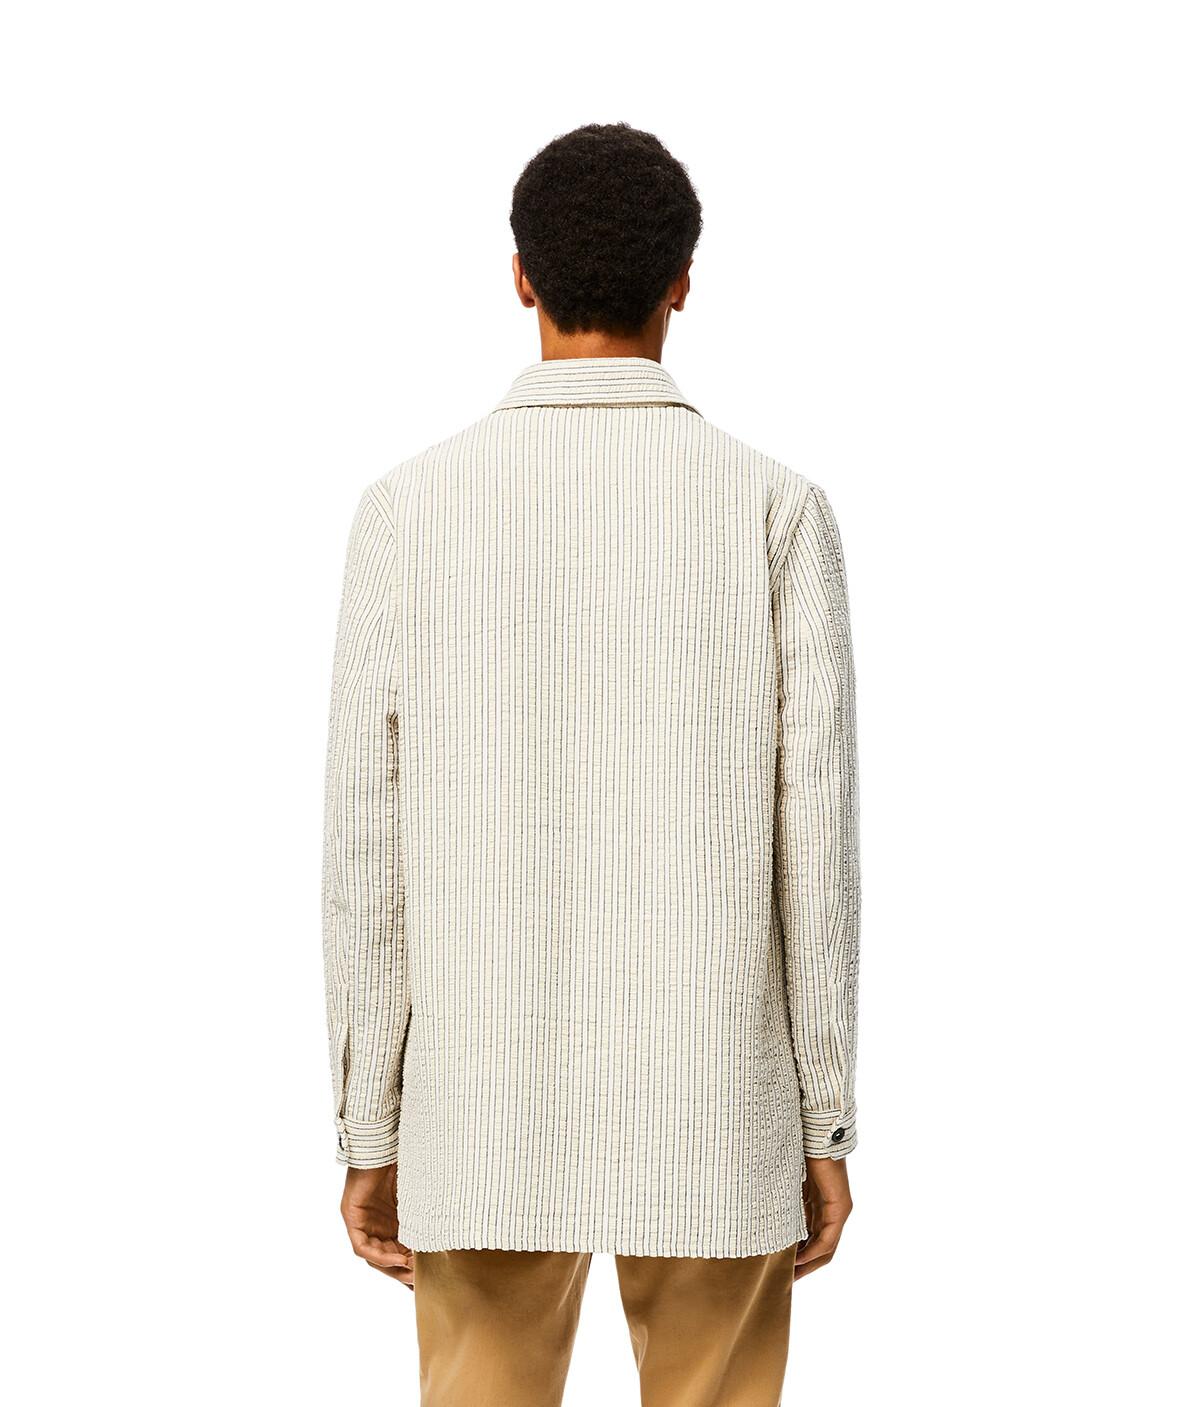 LOEWE Overshirt White/Brown front